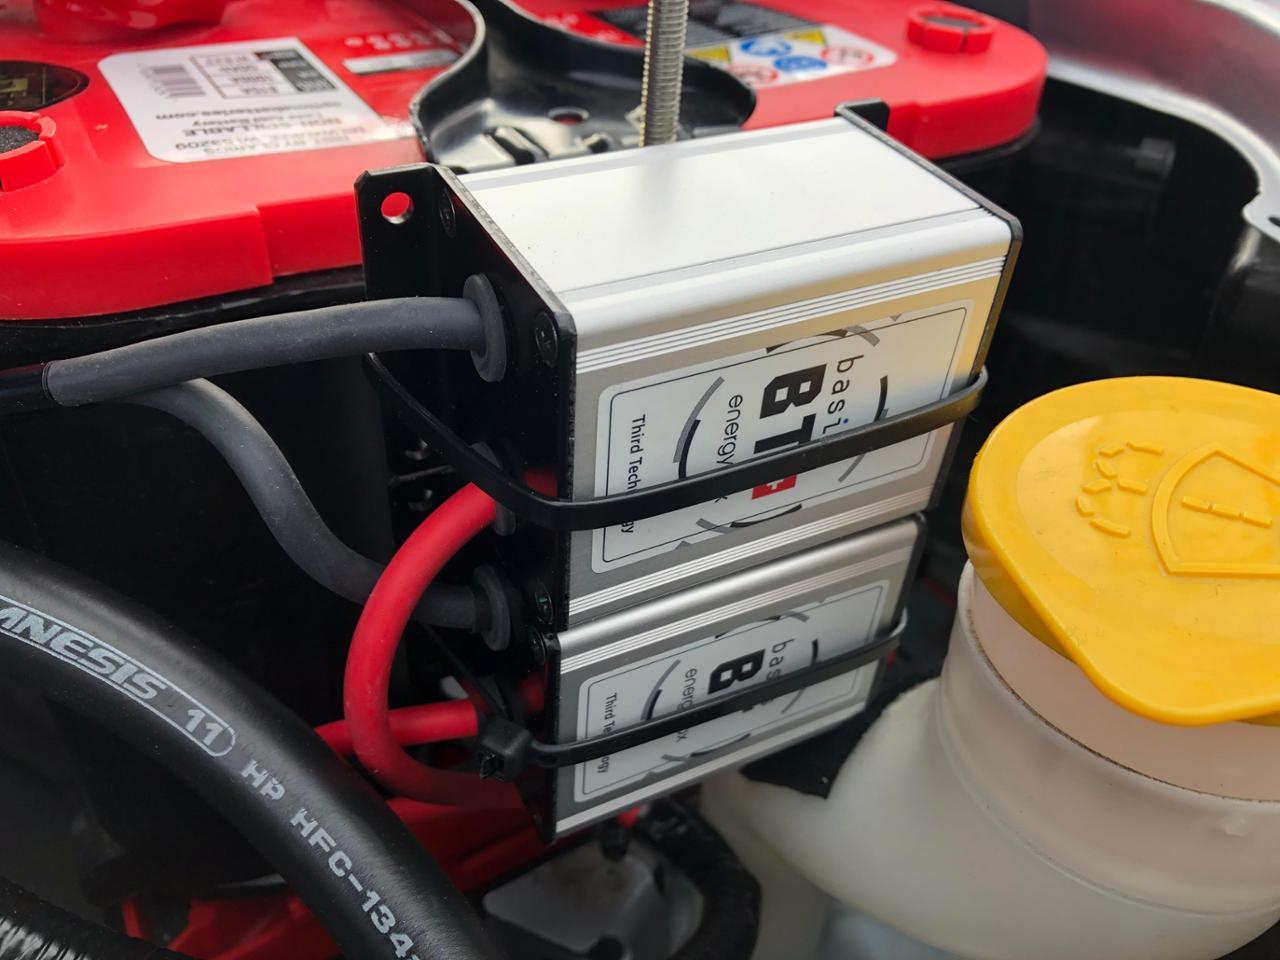 third technology energybox basisBT・BT